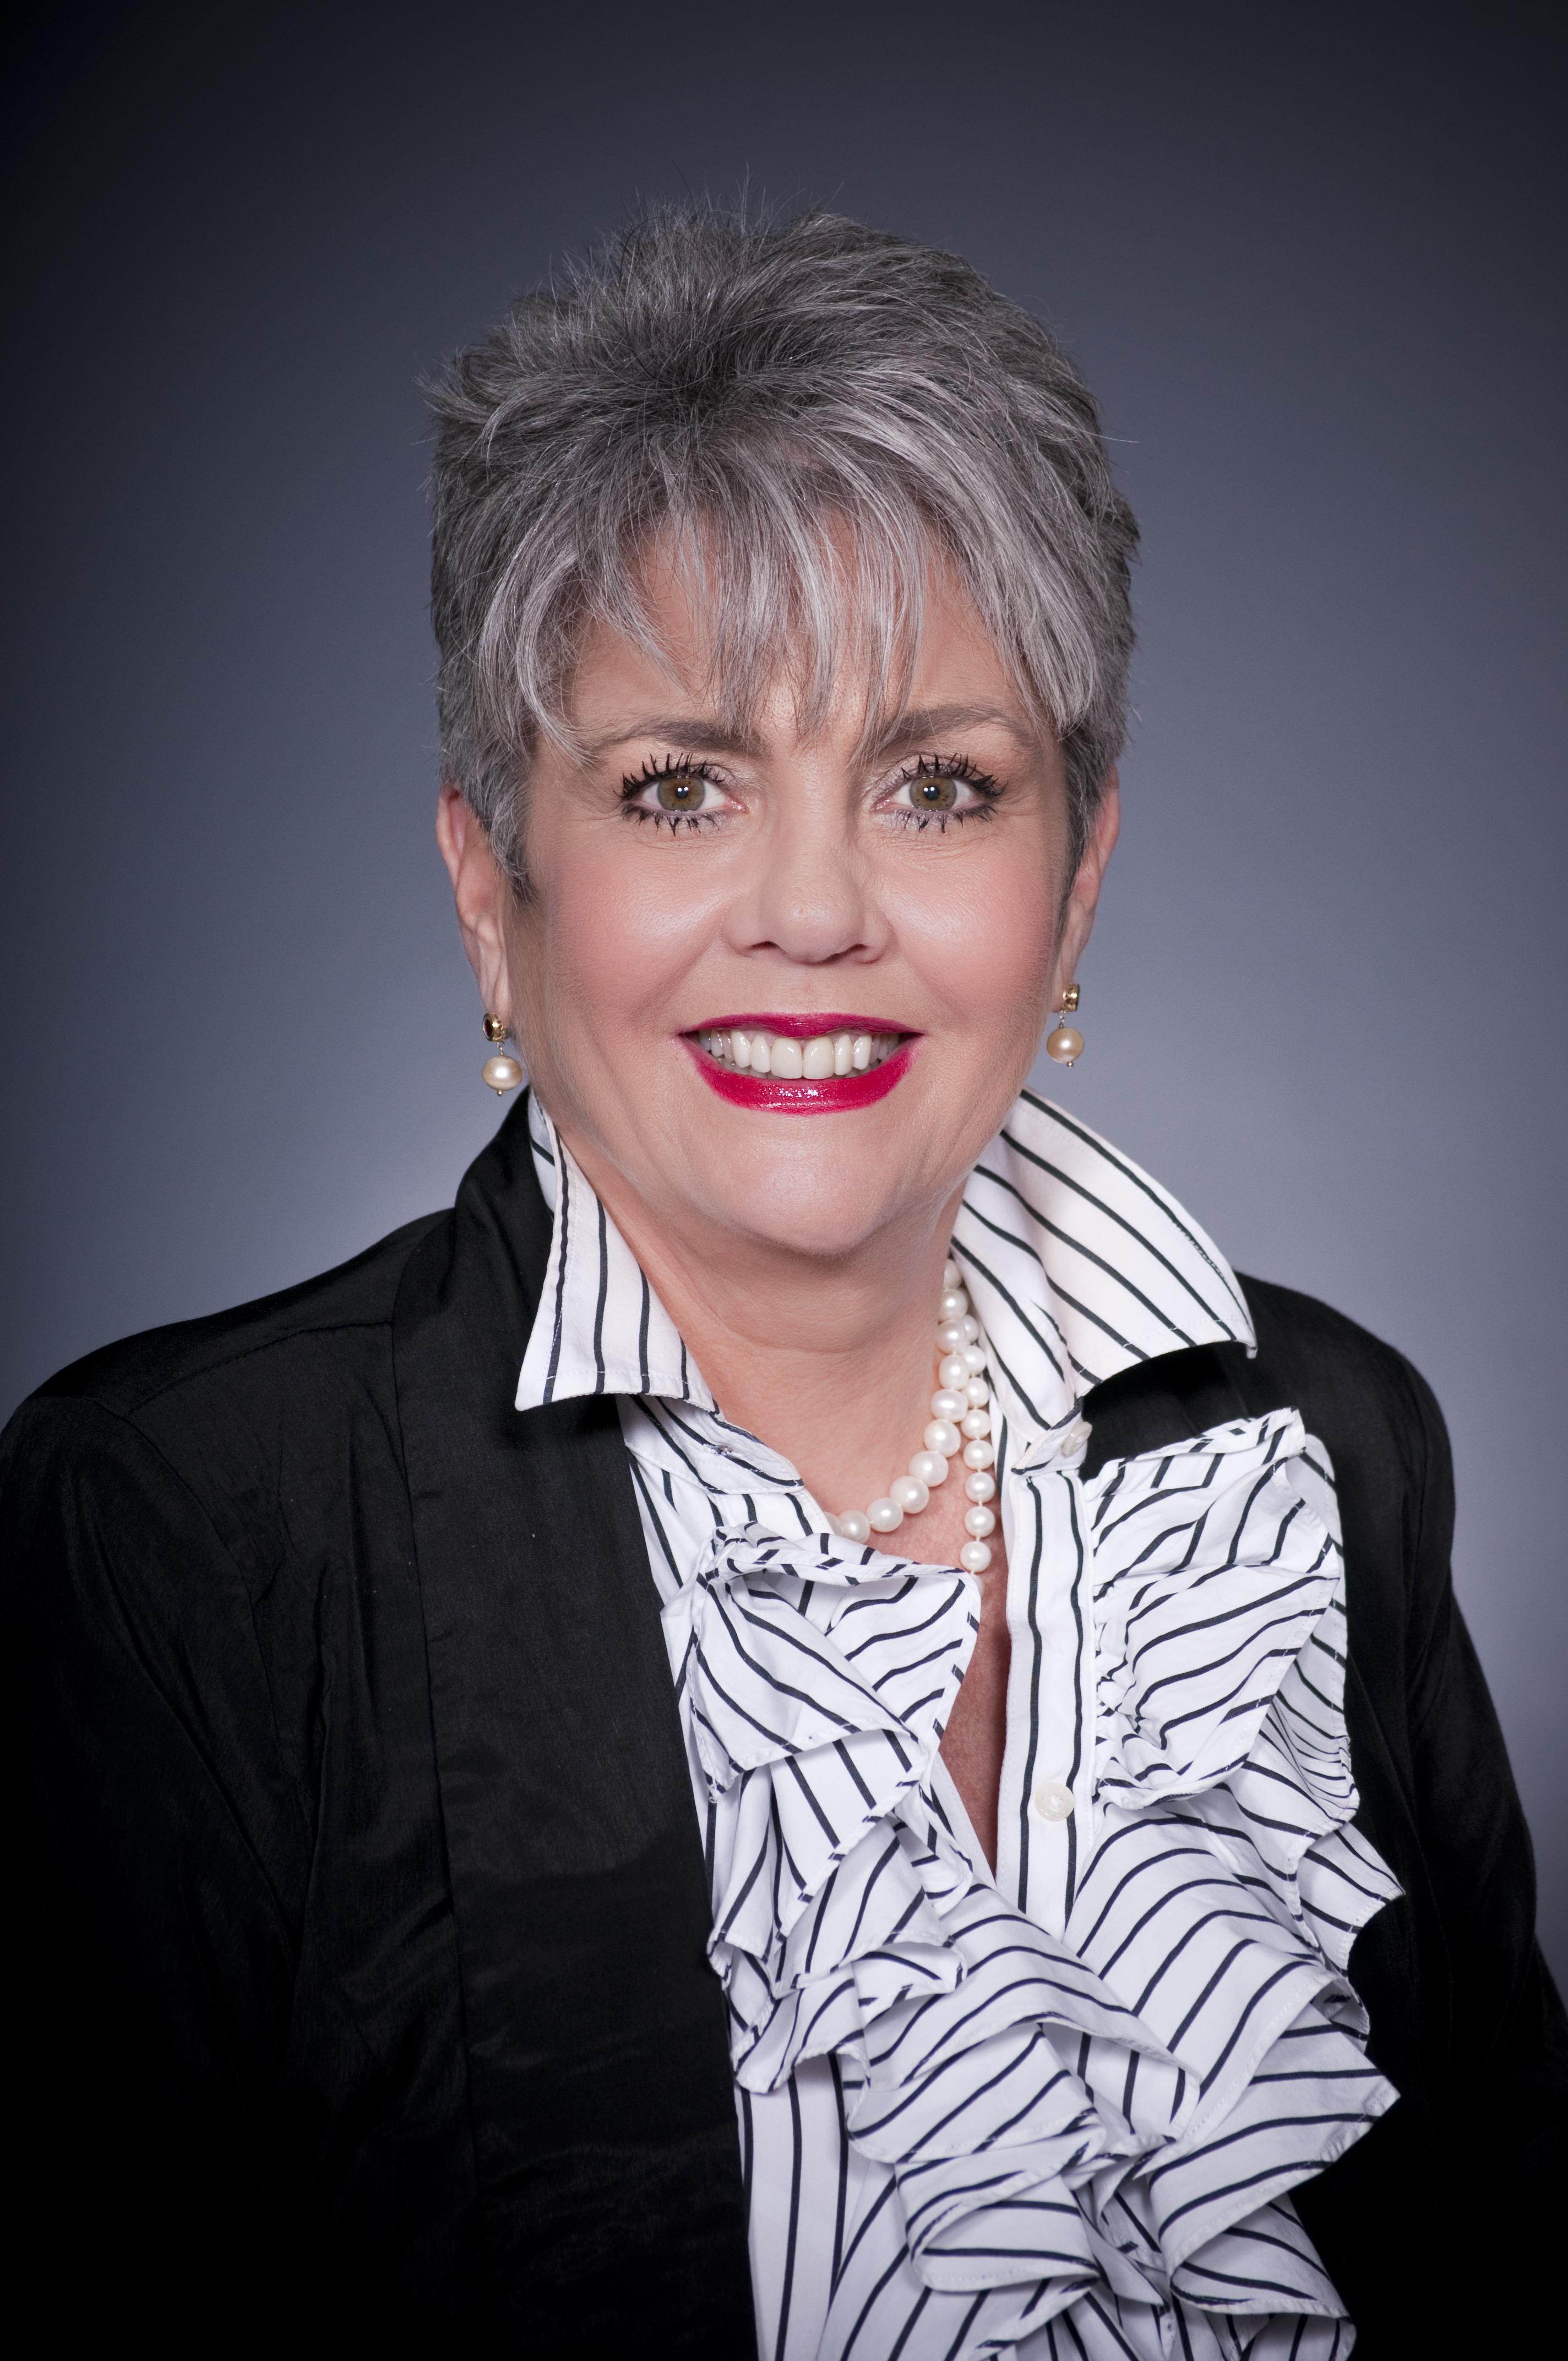 Kelley Parris